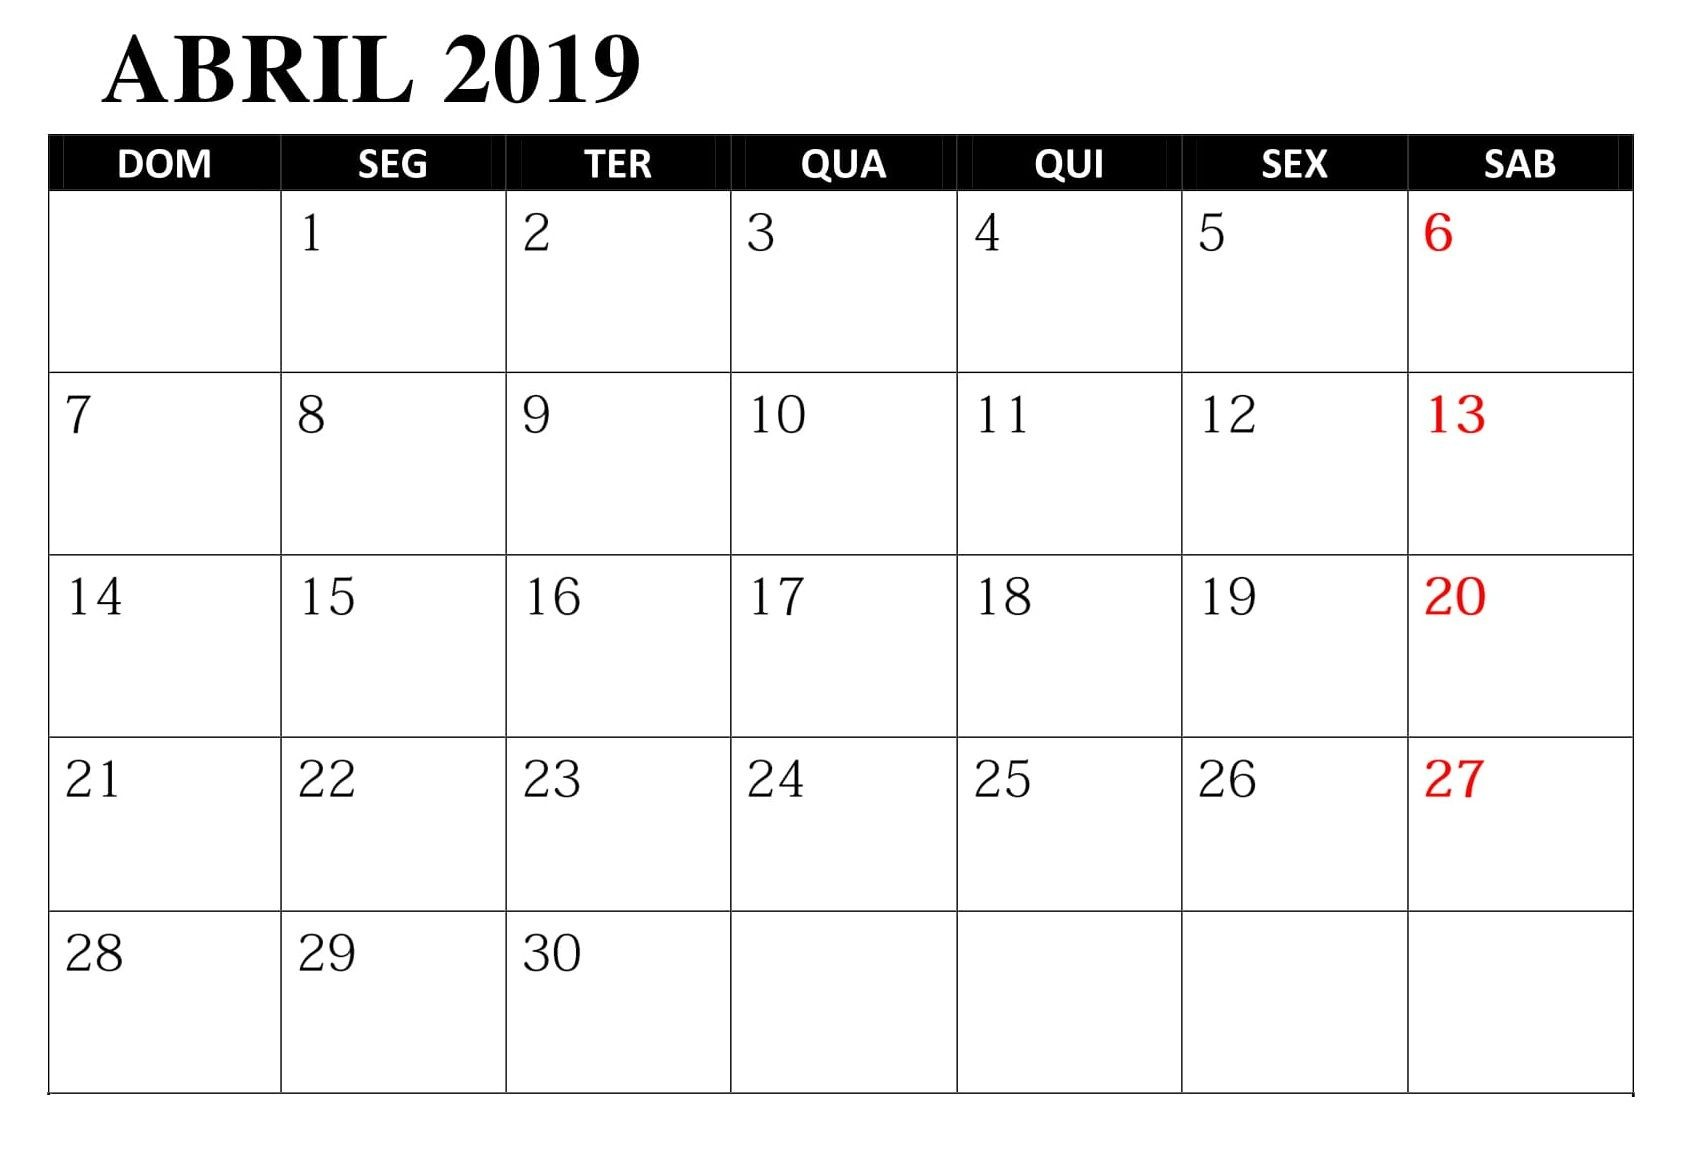 Calendario Escolar 2019 Portugal Más Caliente Calendario Abril 2019 Para Imprimir T Of Calendario Escolar 2019 Portugal Recientes Anahi Anahi9171 On Pinterest